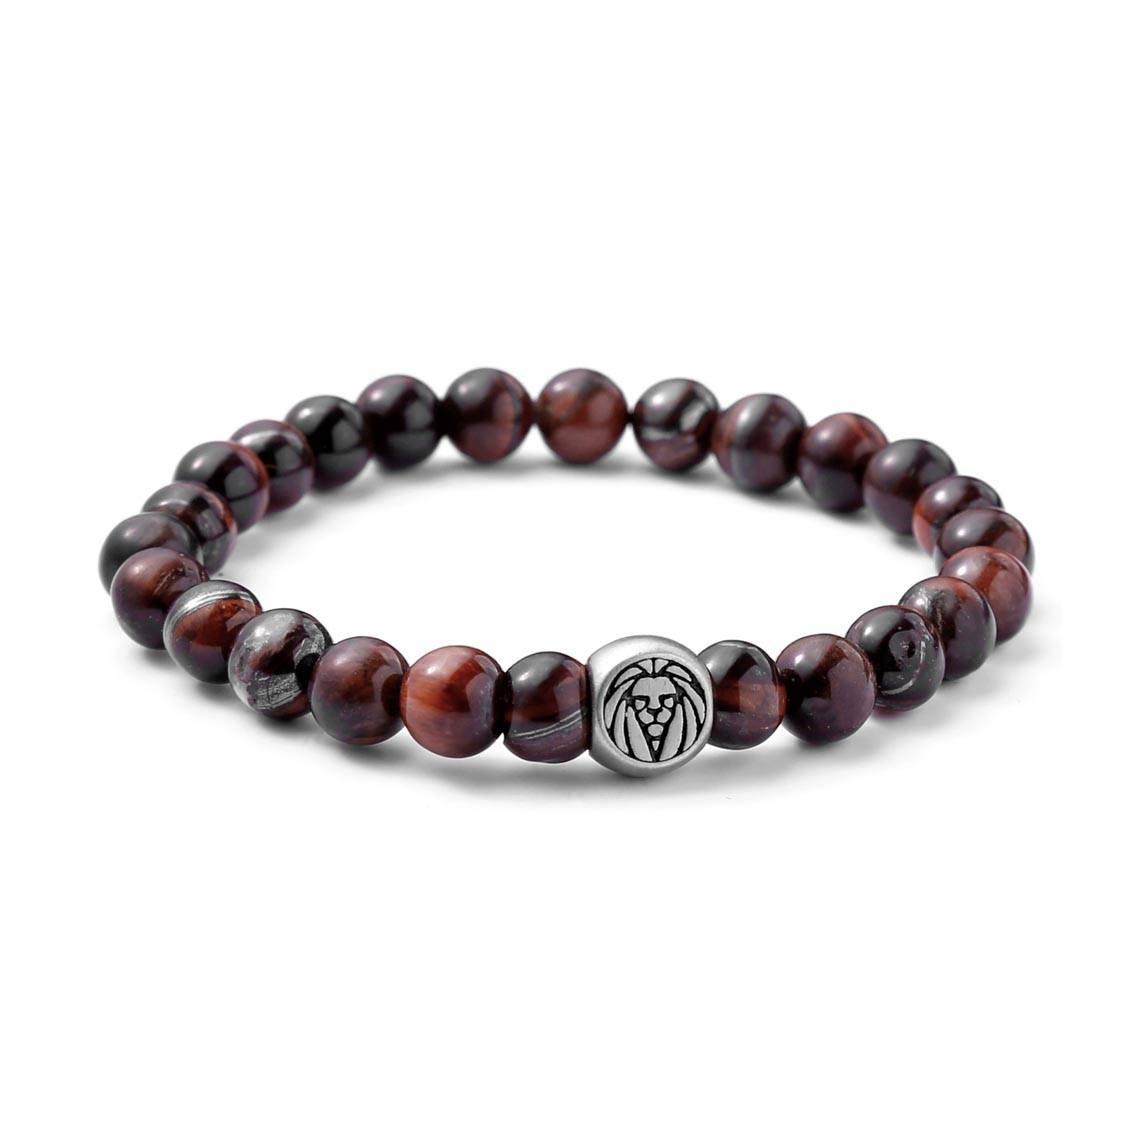 bracelet-lucleon-en-veritable-pierre-naturelle-tigers-eye